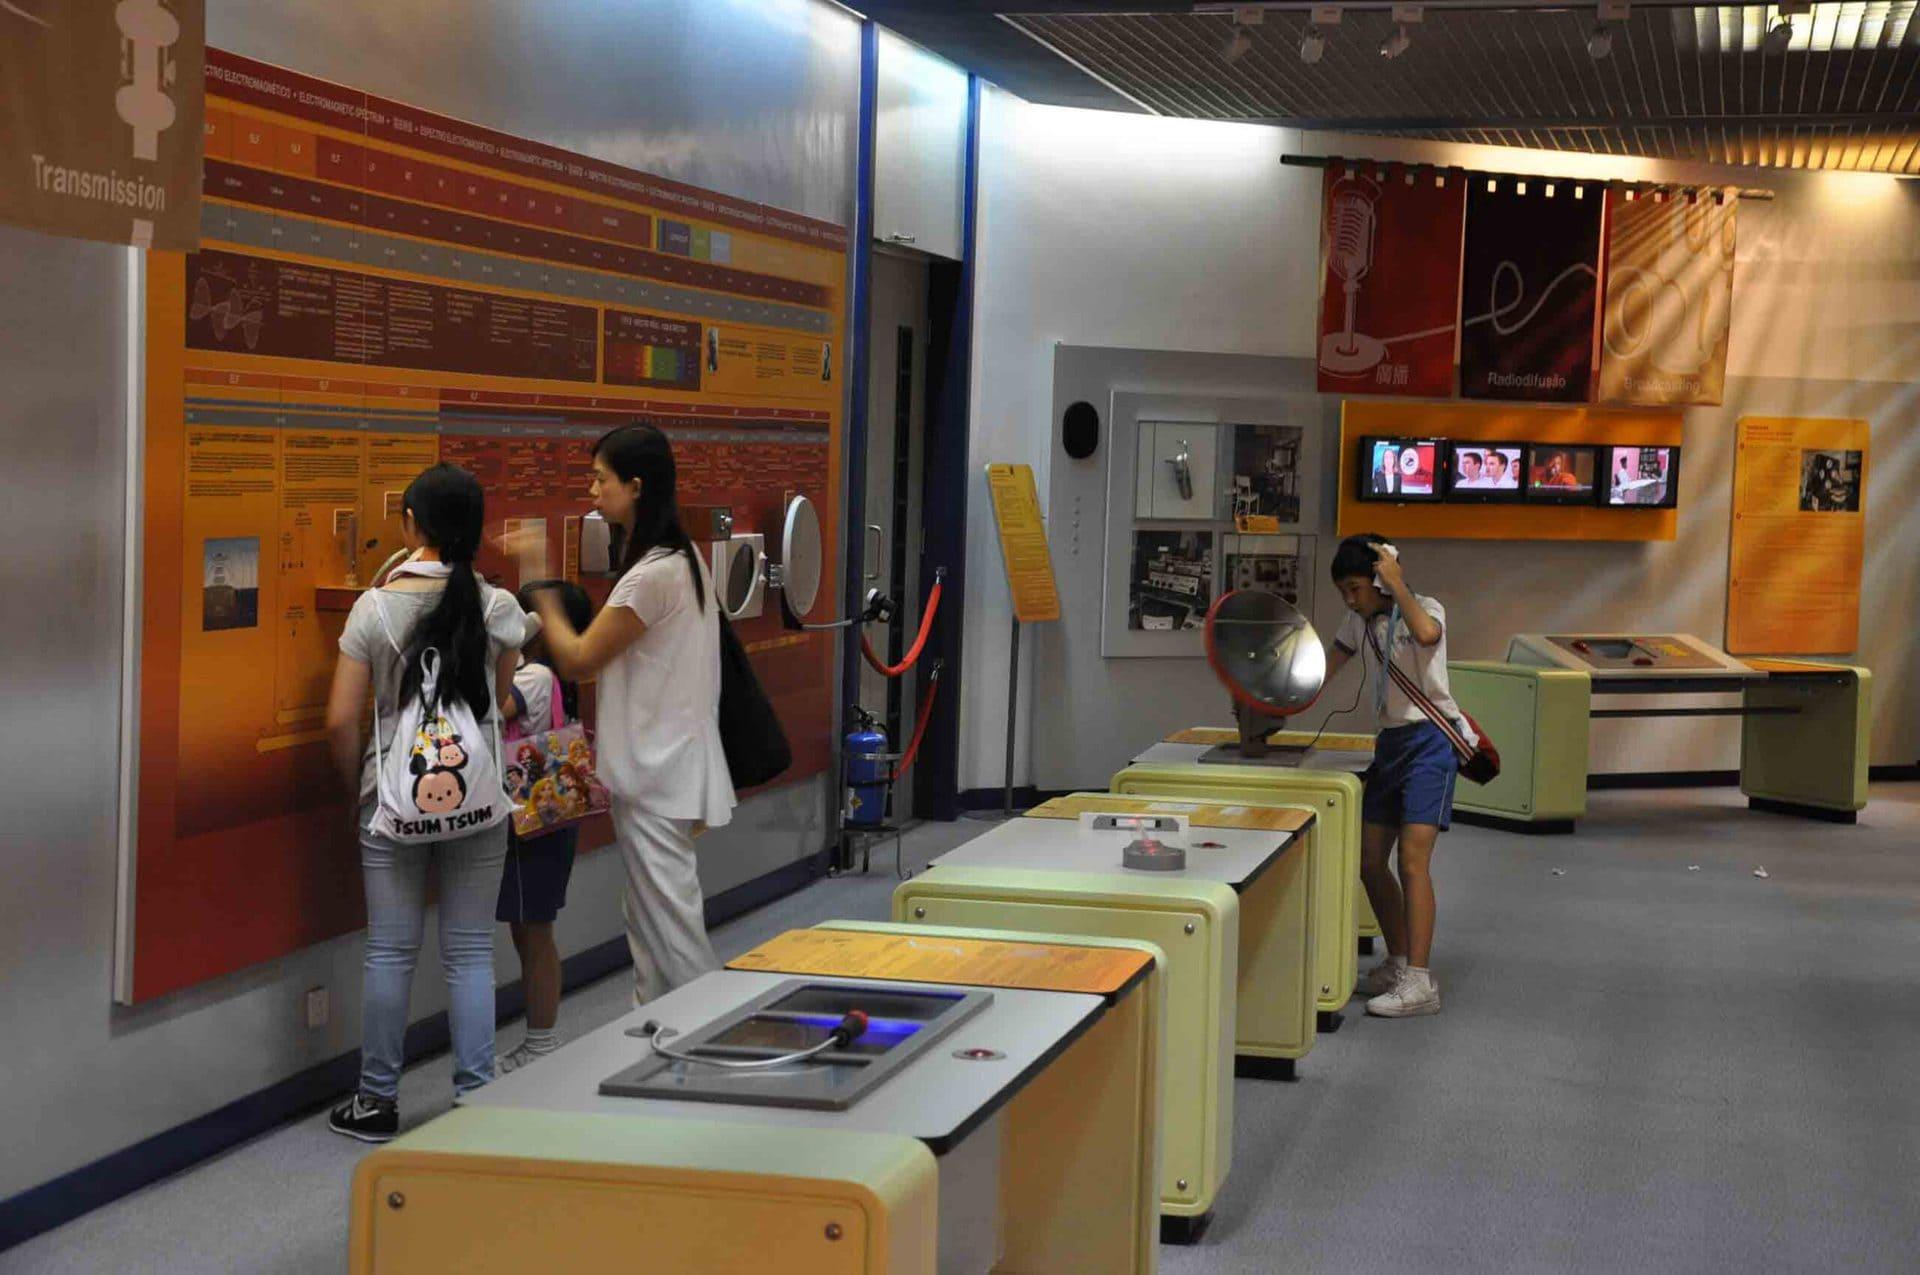 Communications Museum displays